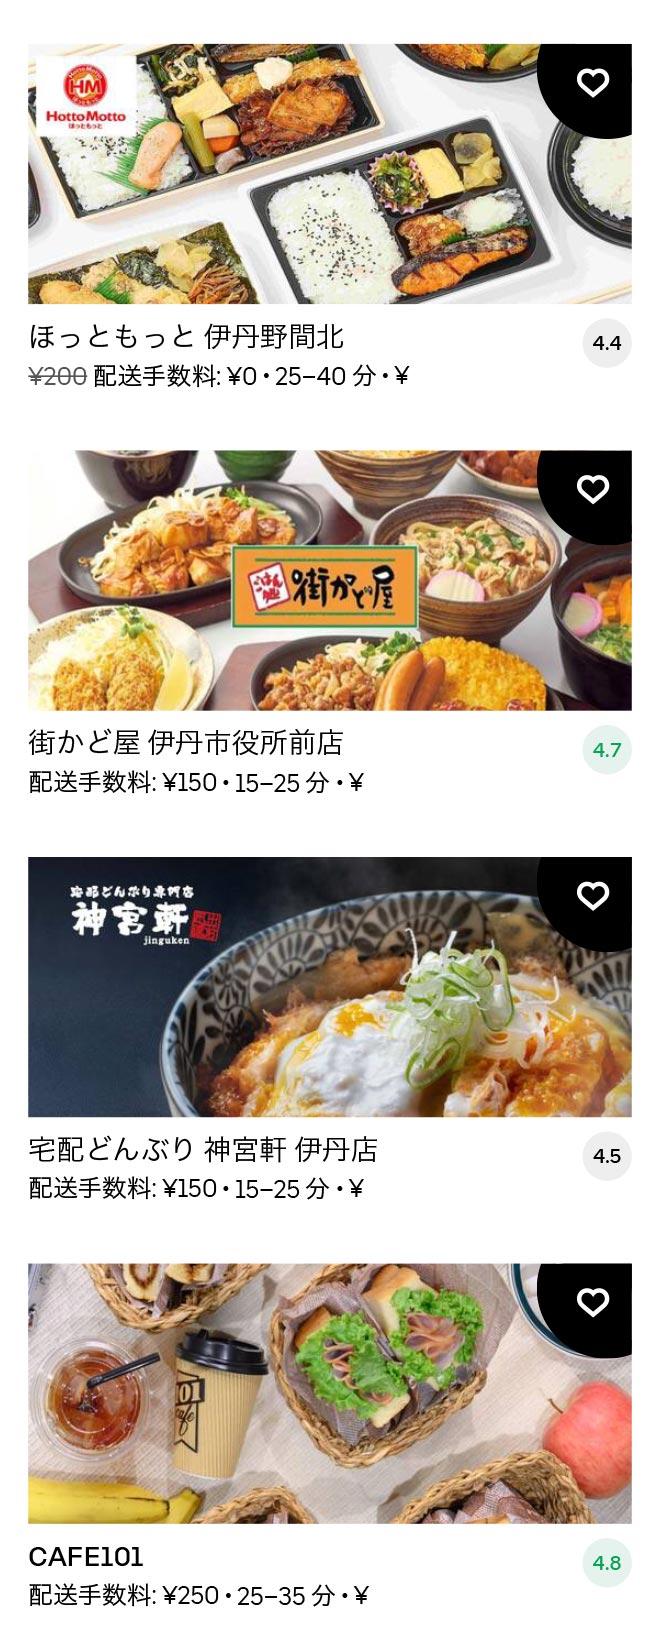 Hankyu itami menu 2011 06